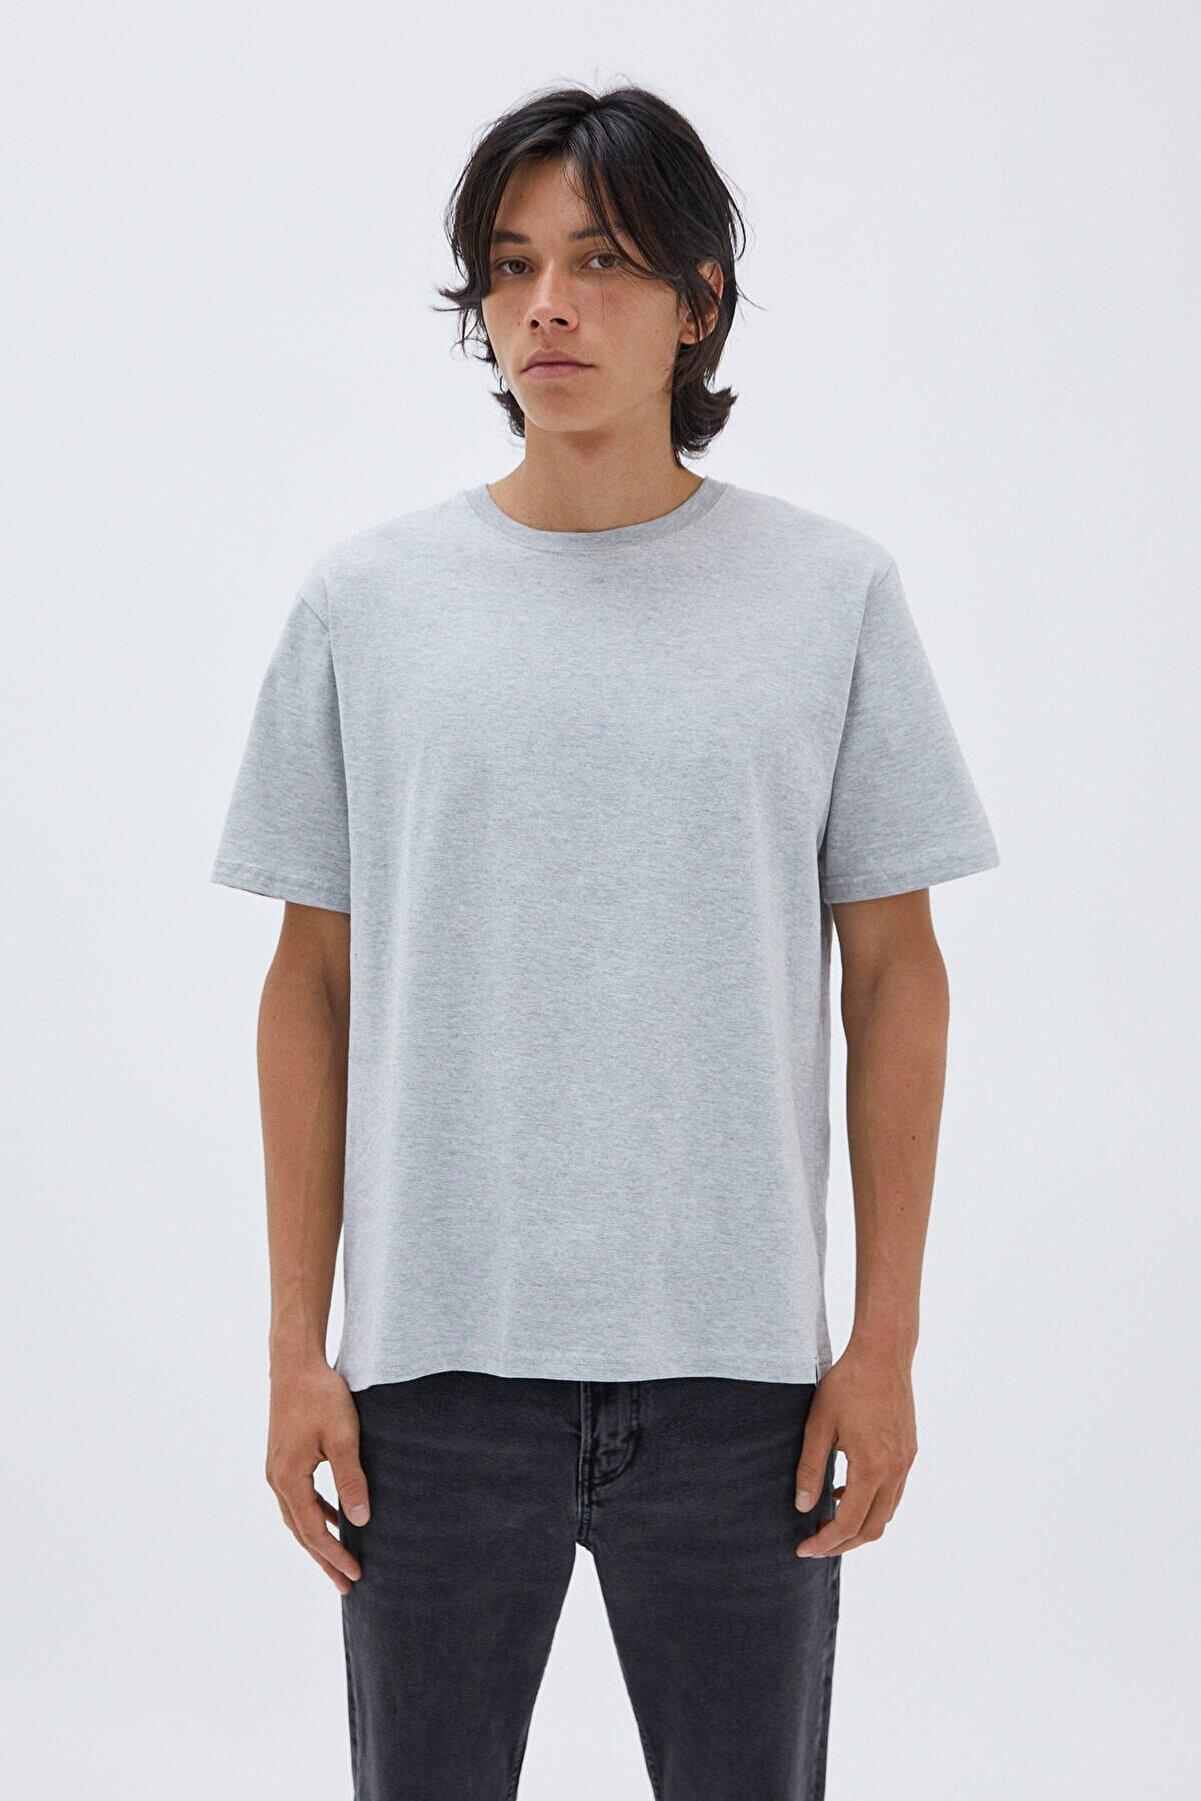 Pull & Bear Join Life basic t-shirt